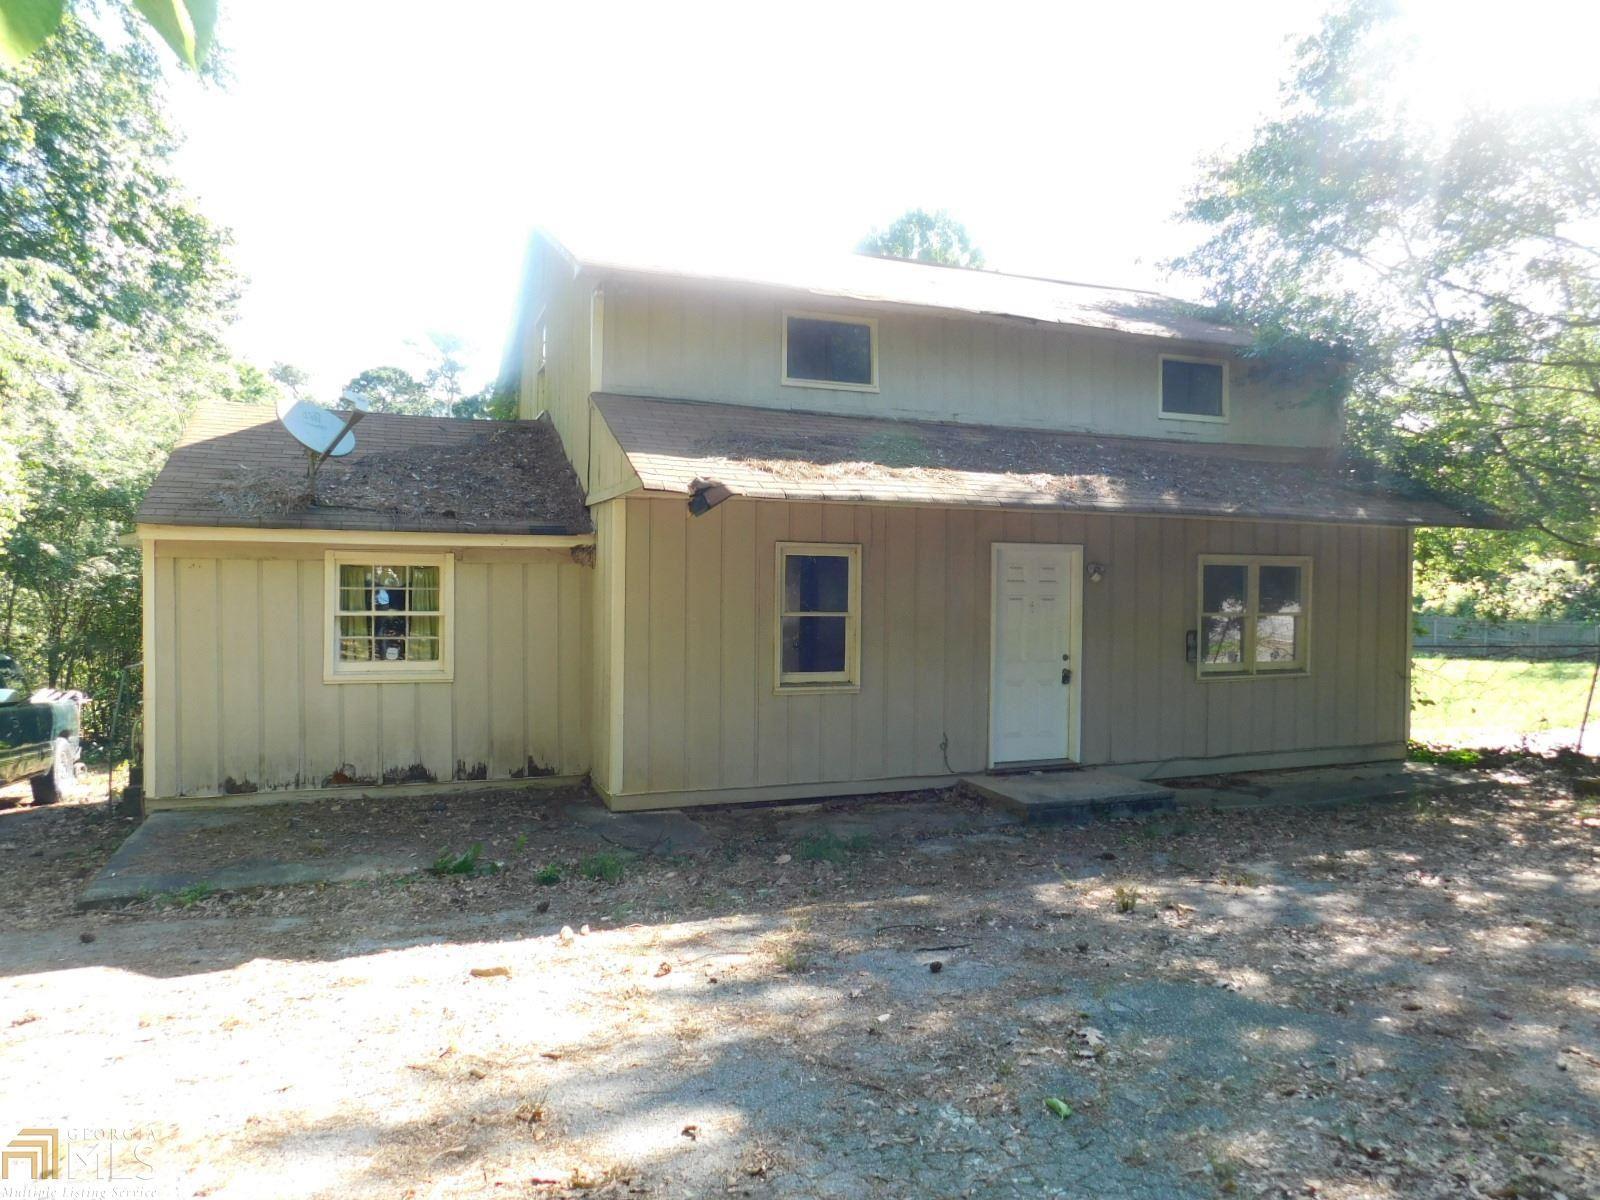 4560 Covington Hwy, Decatur, GA 30035 - MLS#: 8808809